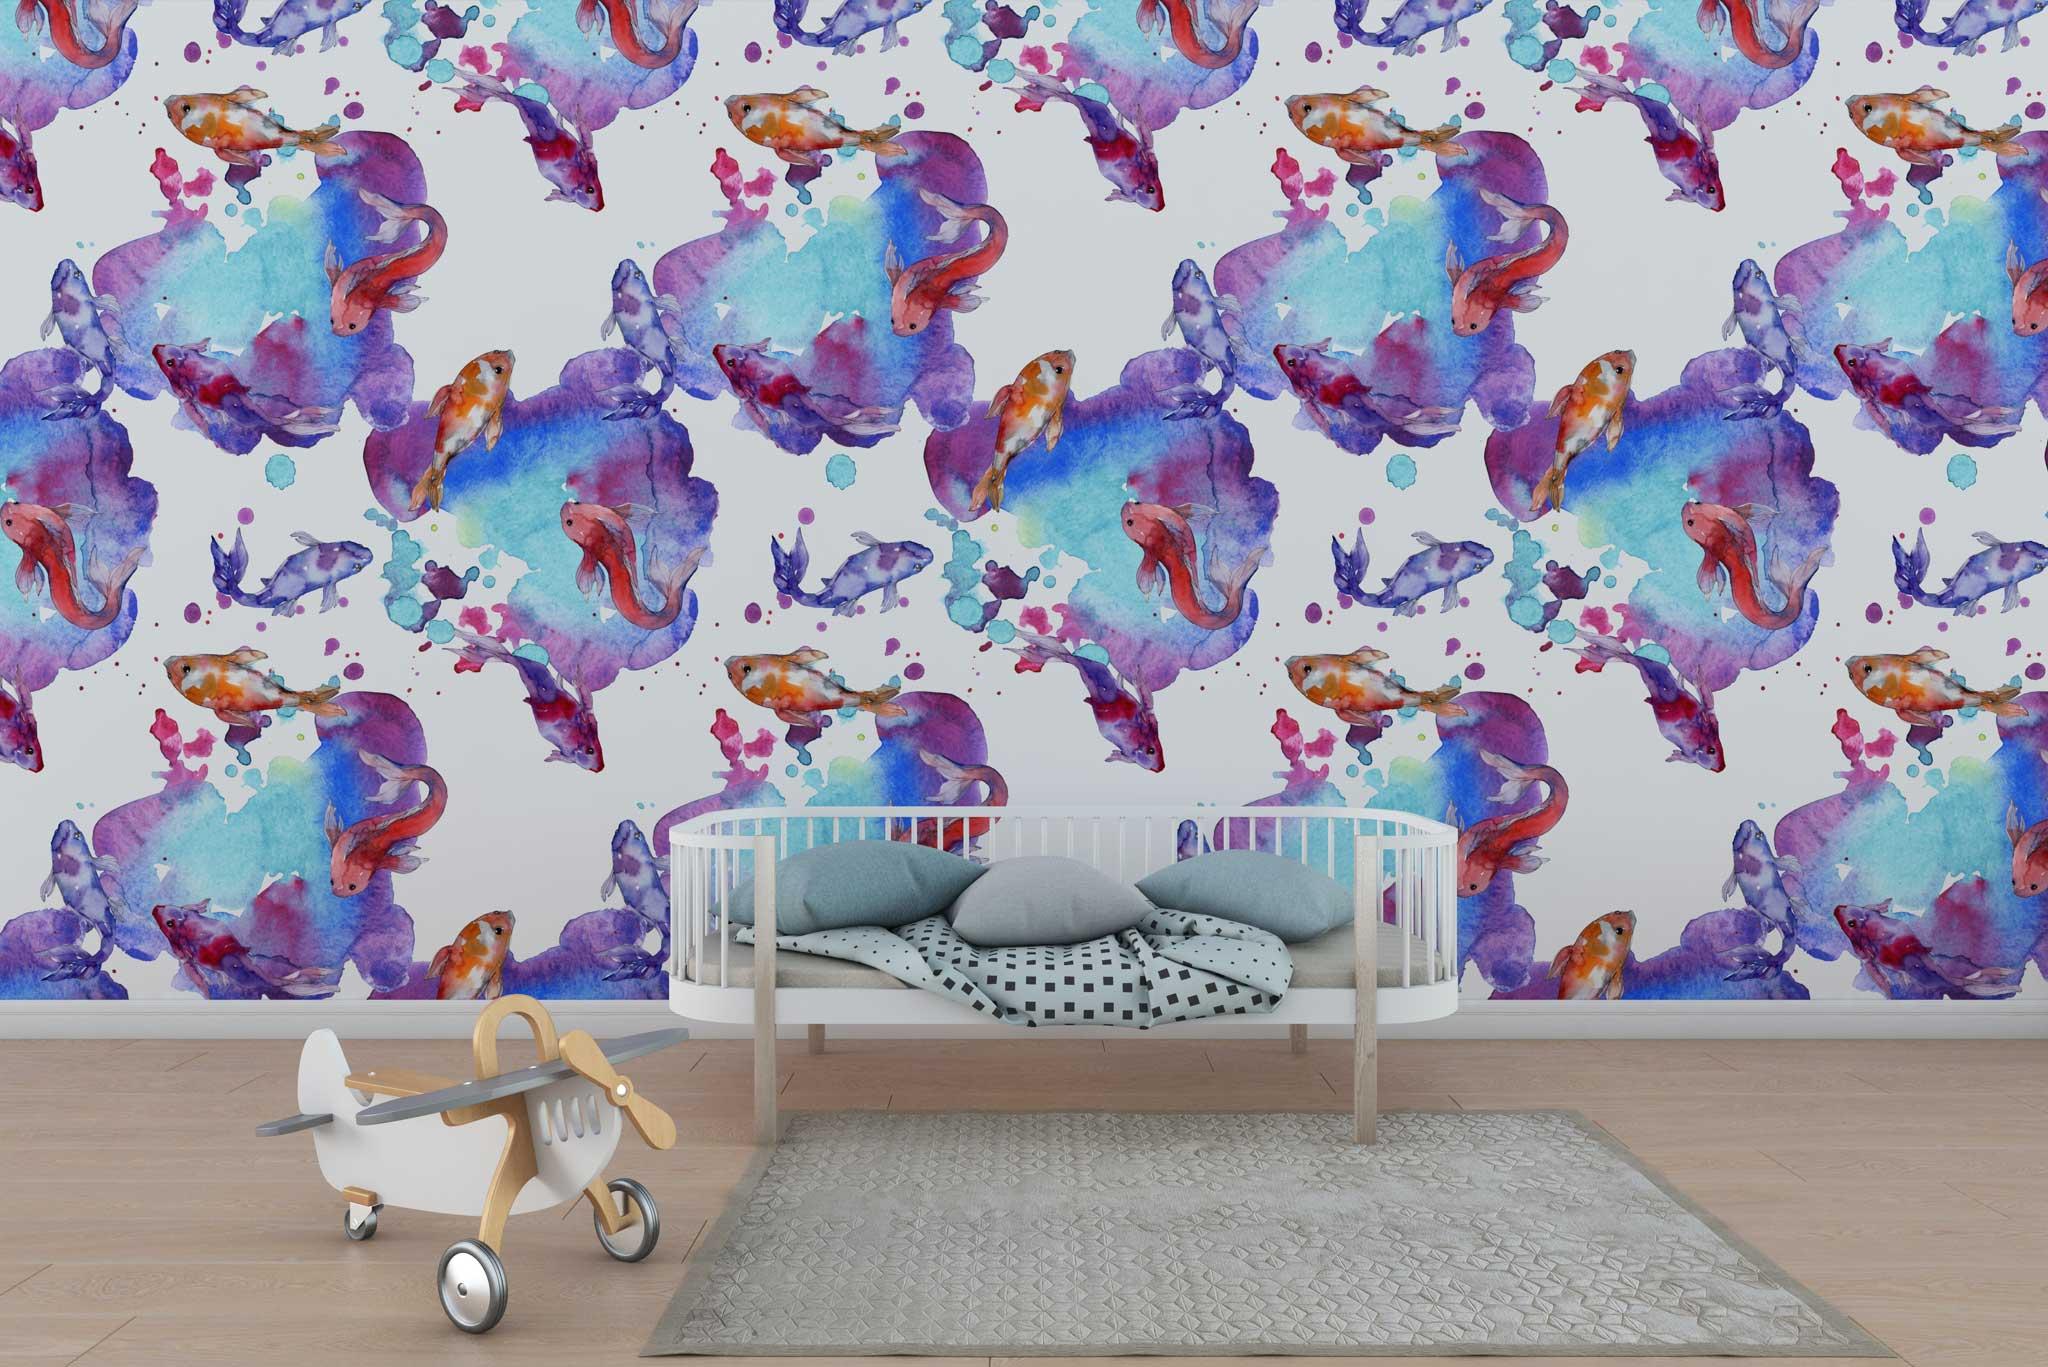 tapet-fototapet-design-personalizat-customizabil-comanda-special-camera-dormitor-copii-model-desen-acuarela-pesti-rosu-mov-albastru-fundal-alb